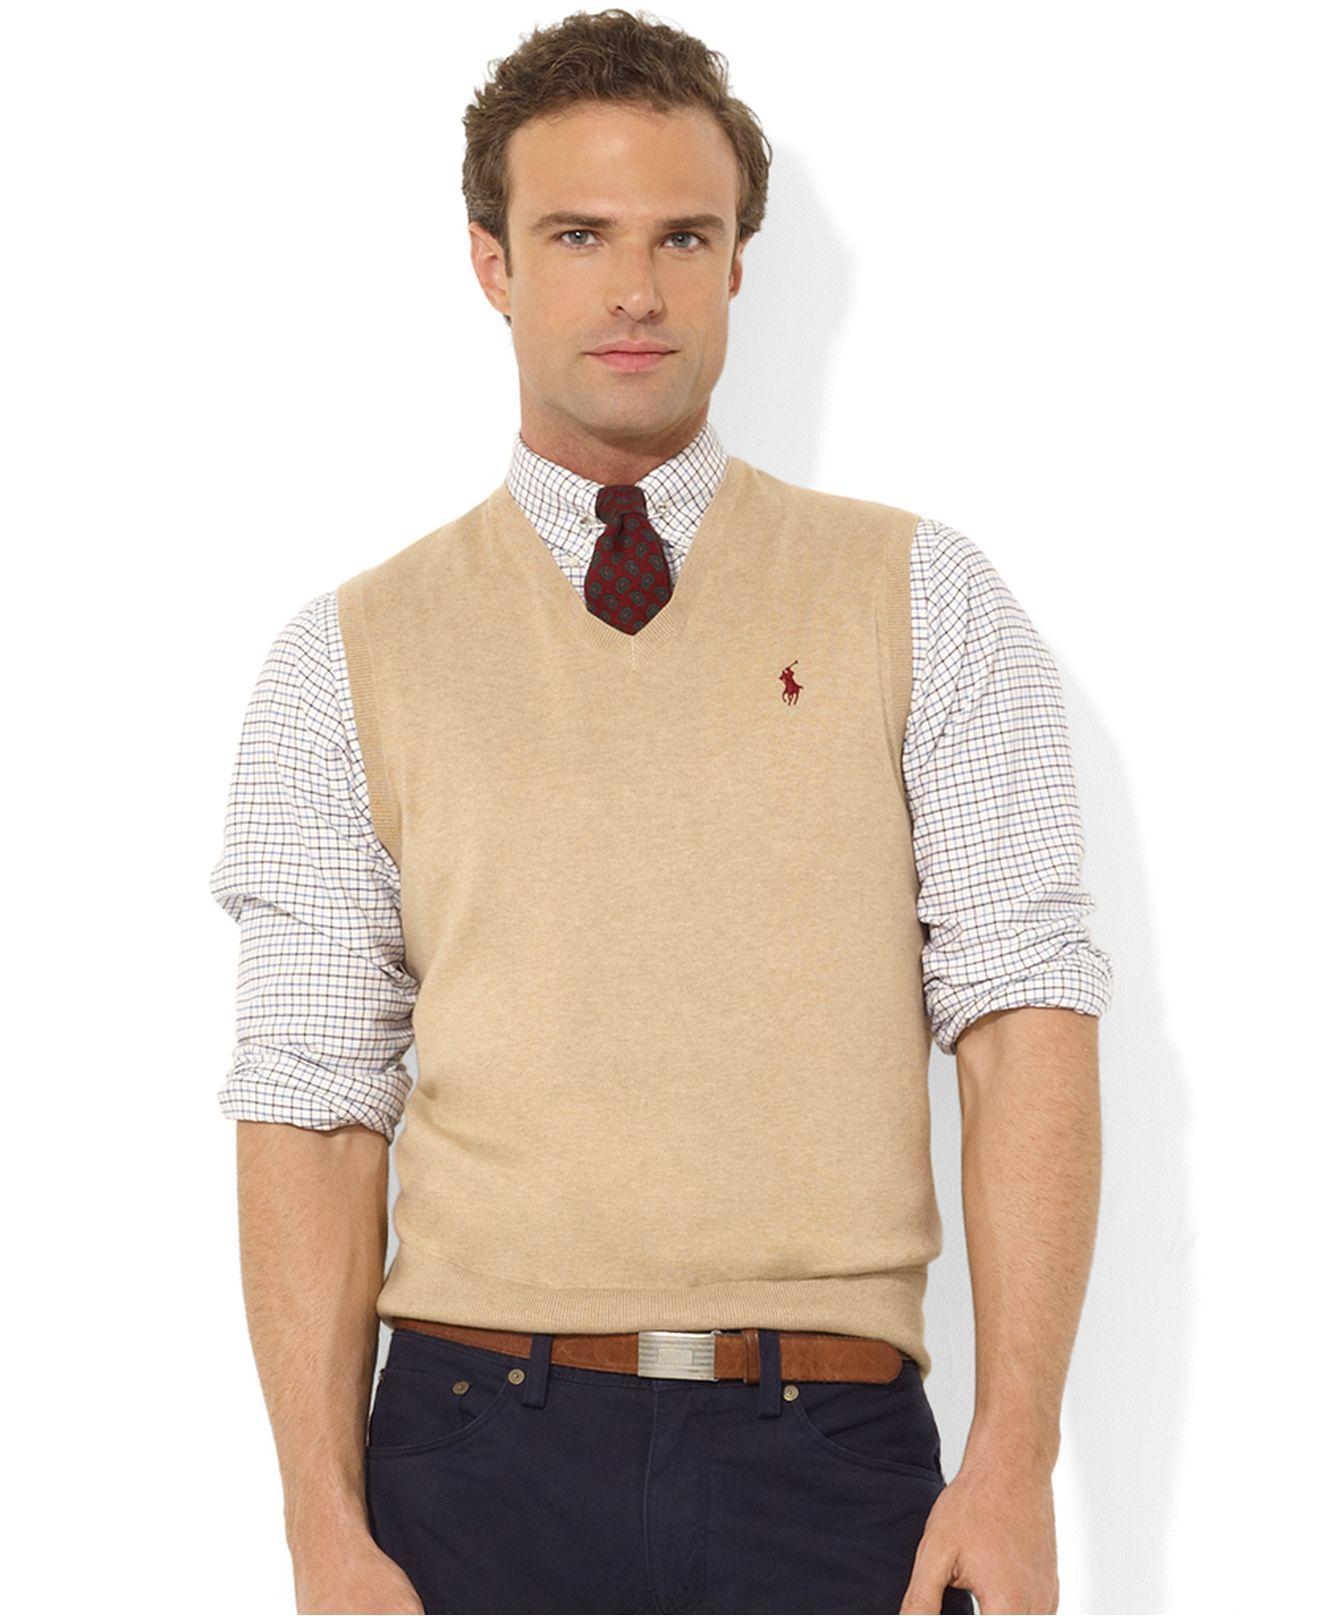 43e95b0d6 Polo Ralph Lauren Sweater Vest